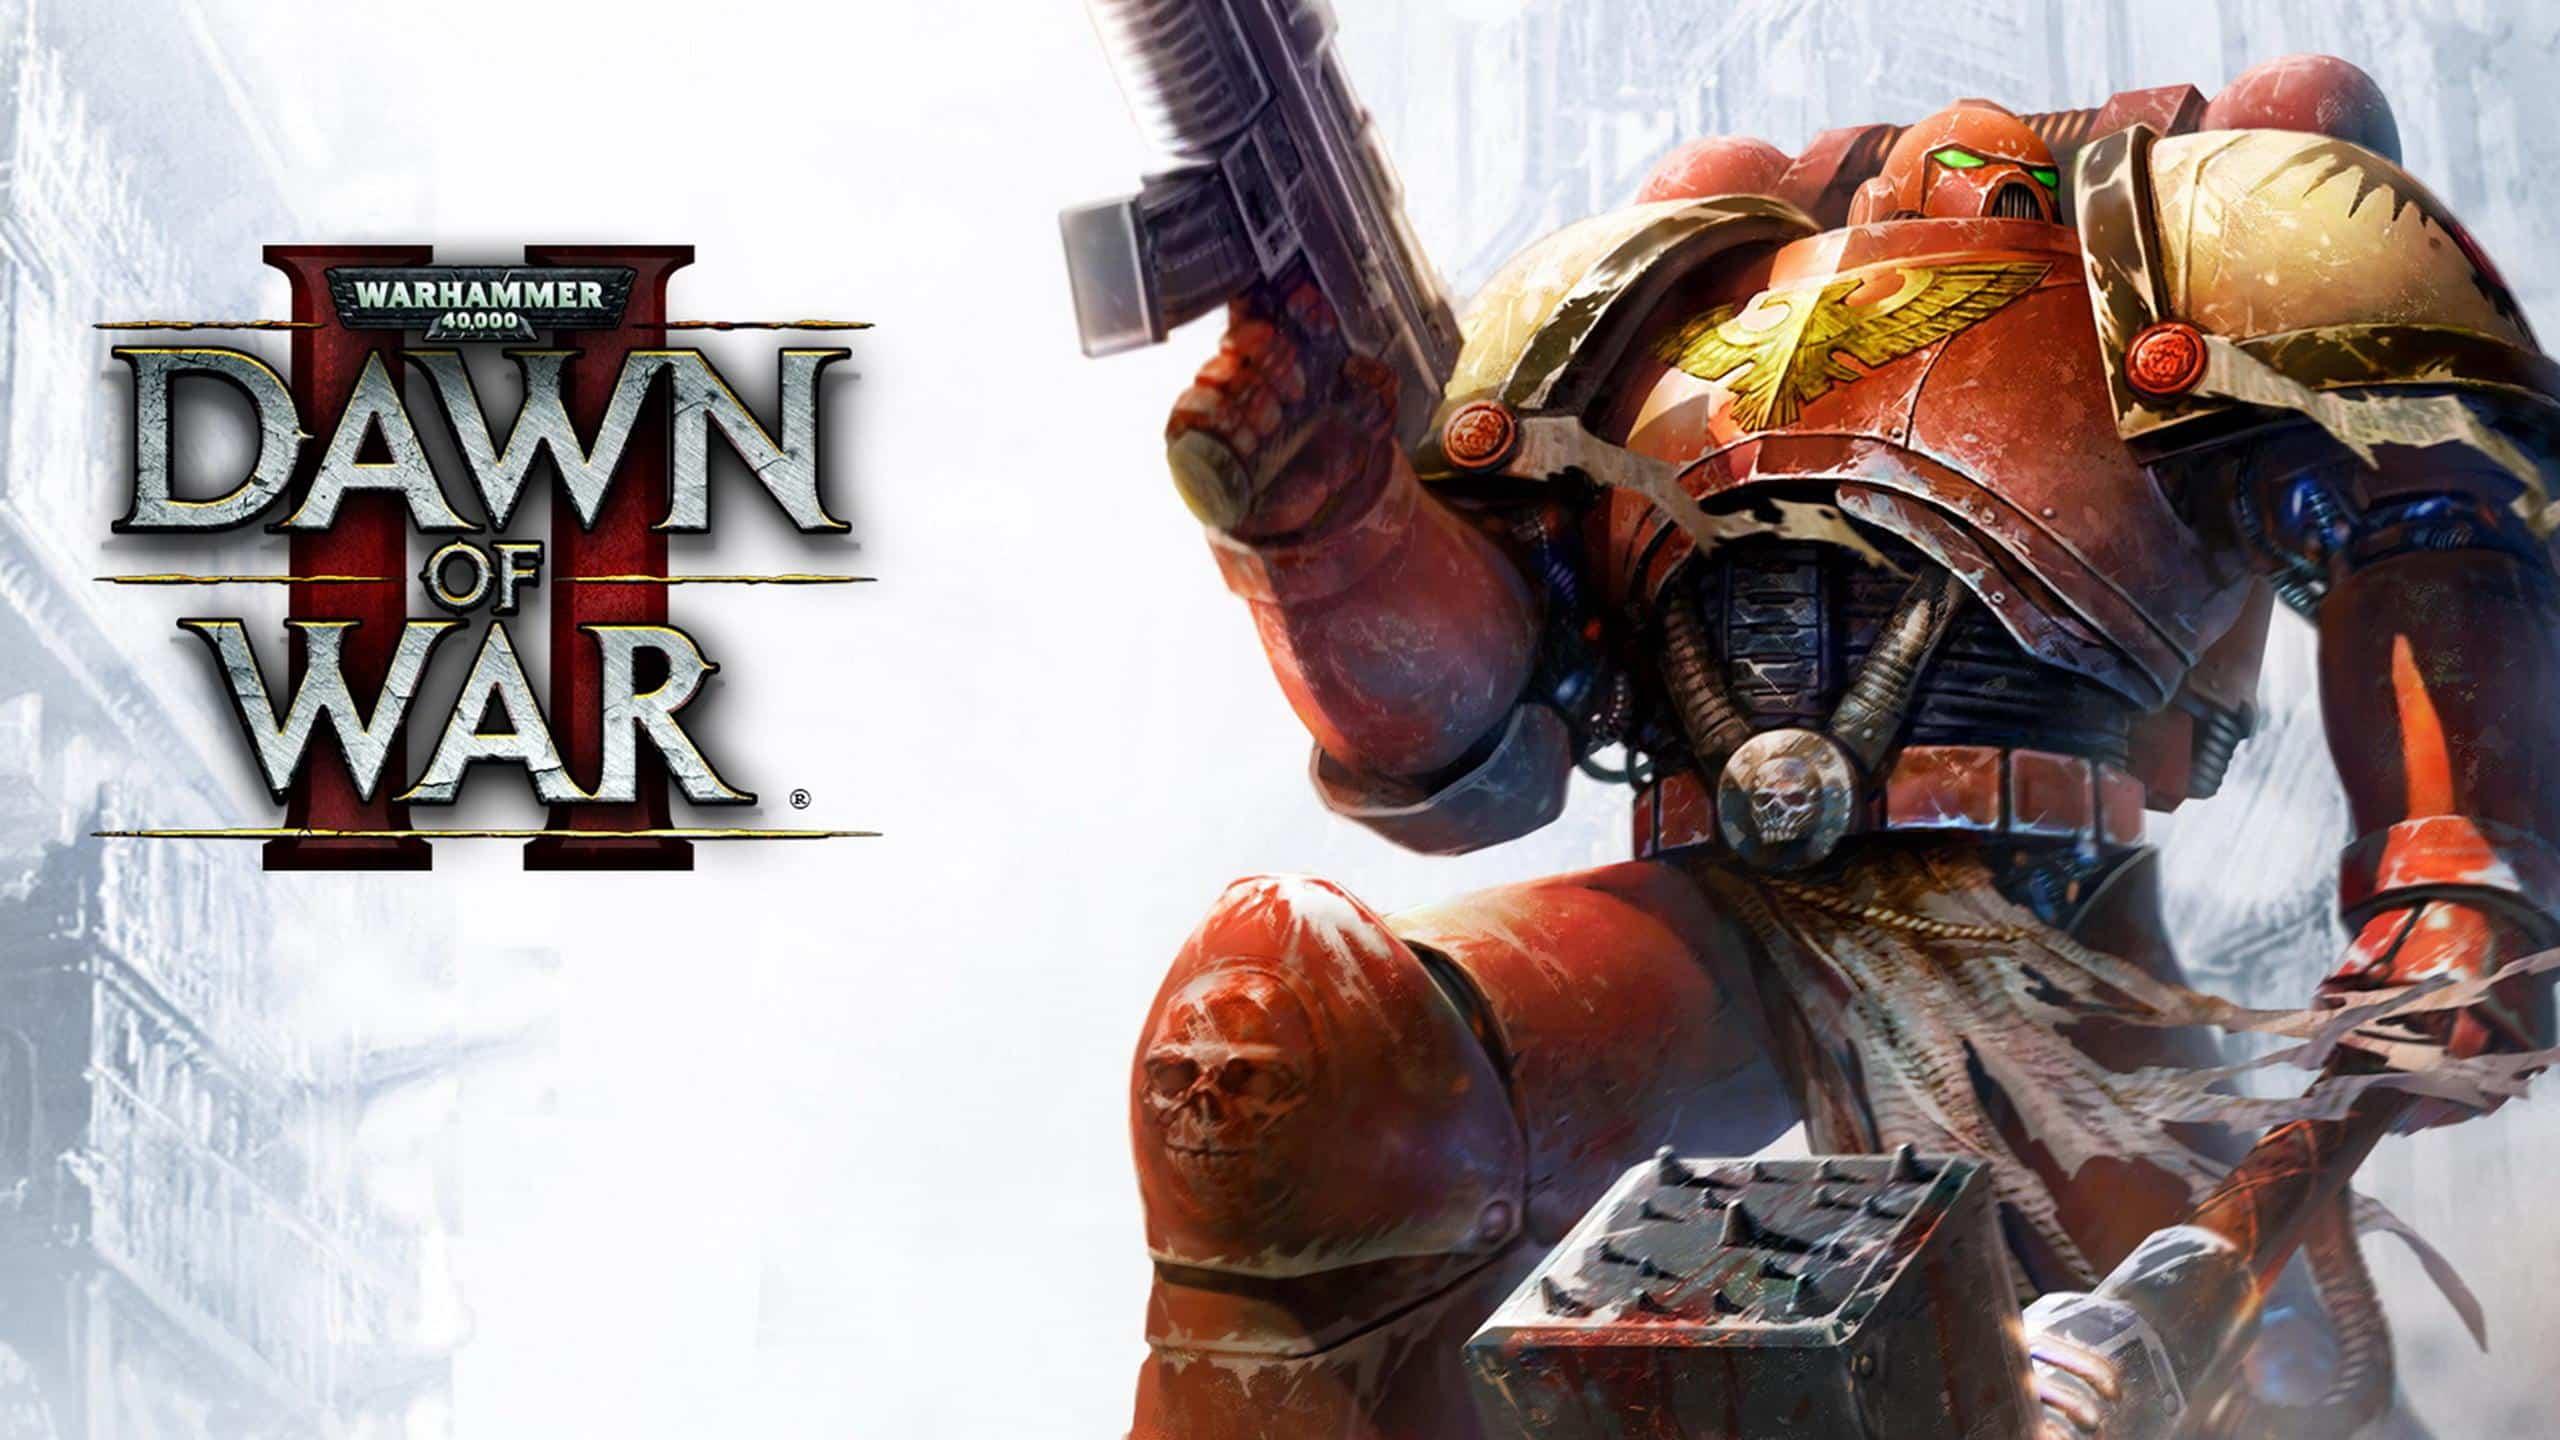 Warhammer 40,000: Dawn of War II telecharger gratuit de PC et Torrent